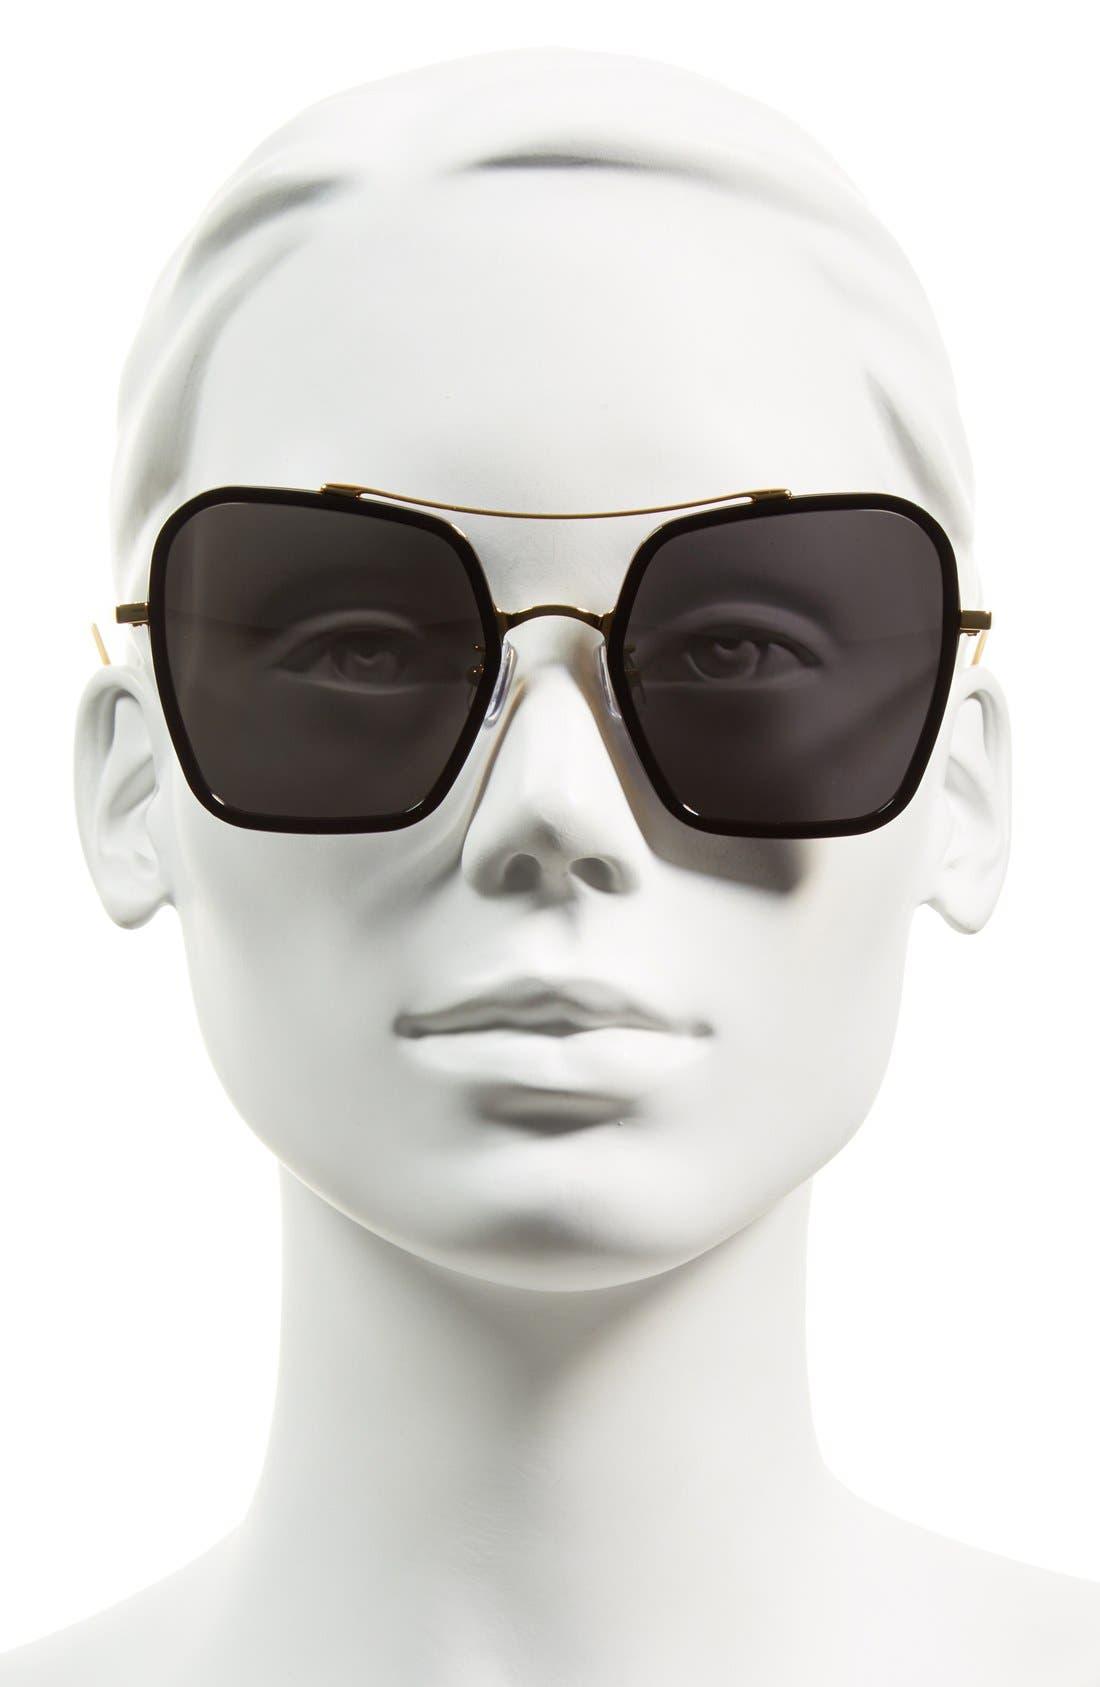 53mm Retro Square Sunglasses,                             Alternate thumbnail 5, color,